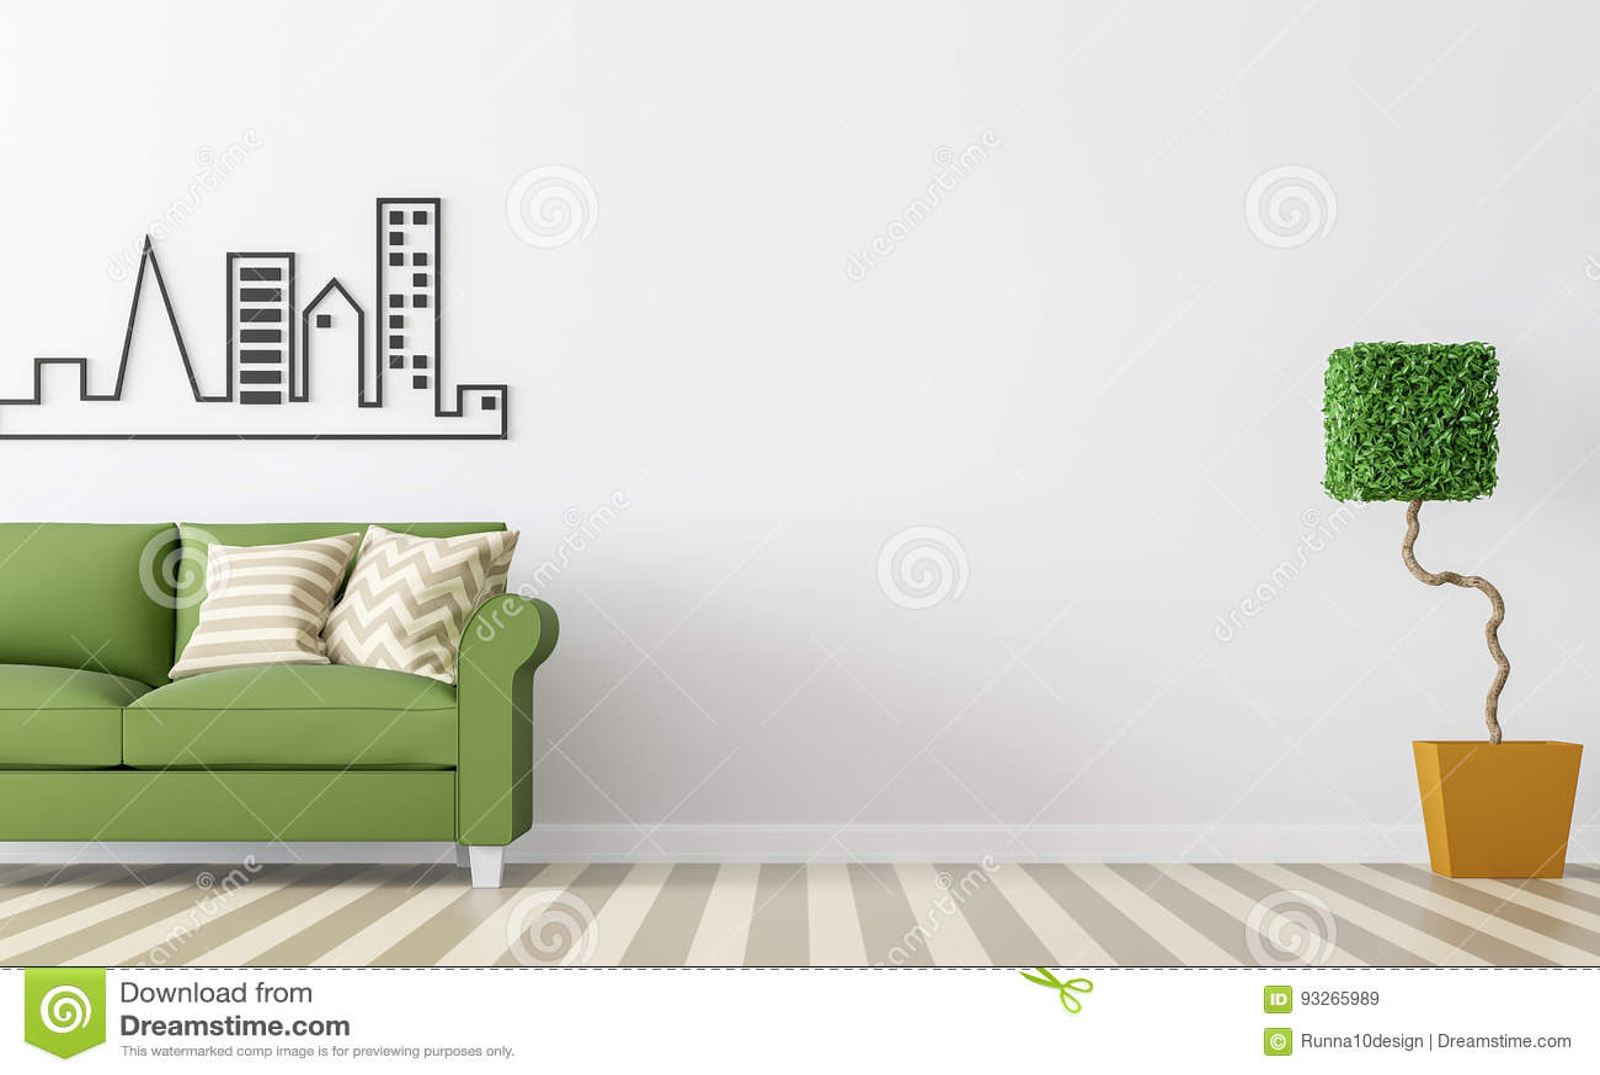 Modern White Living Room Interior With Green Sofa 3d Rendering Image Stock Illustration Illustration Of Imagethere Indoor 93265989